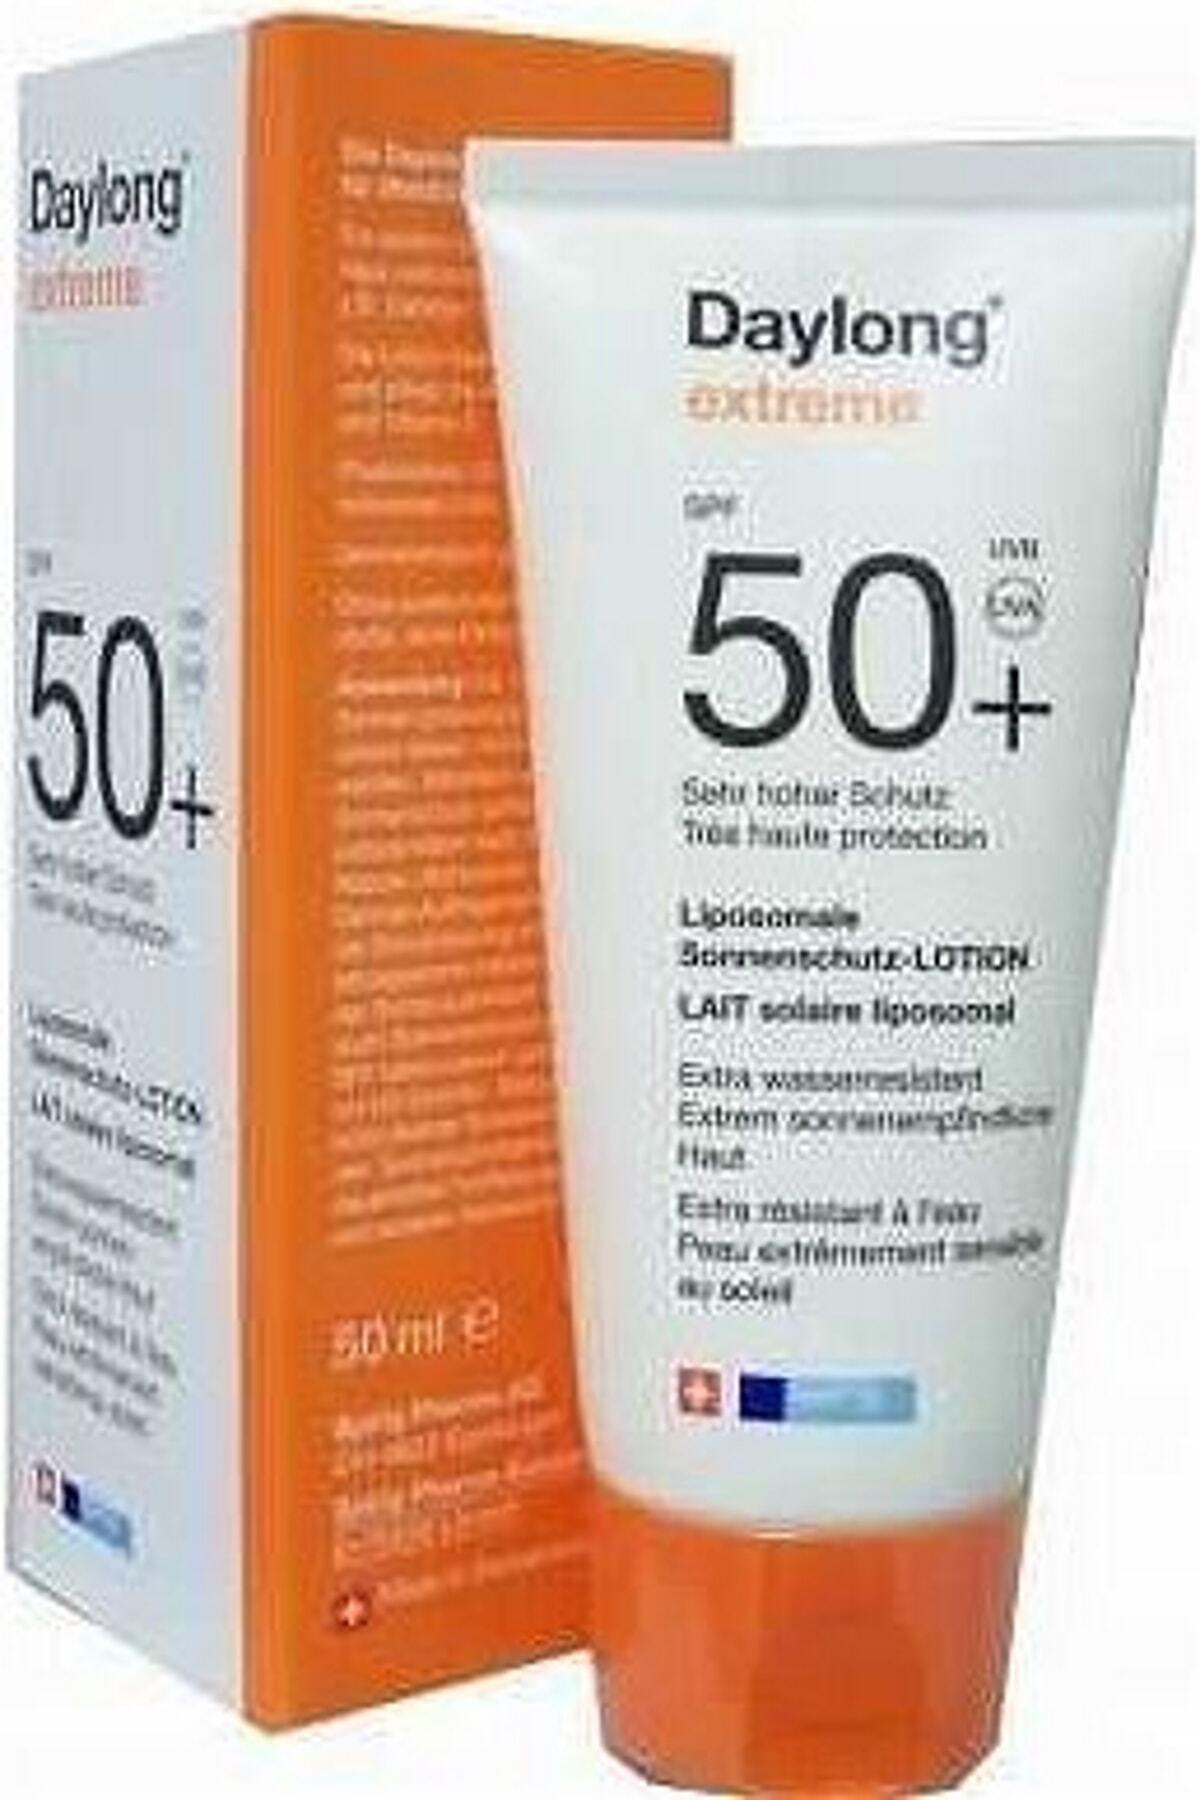 Daylong Extreme Spf 50+ 50ml 1